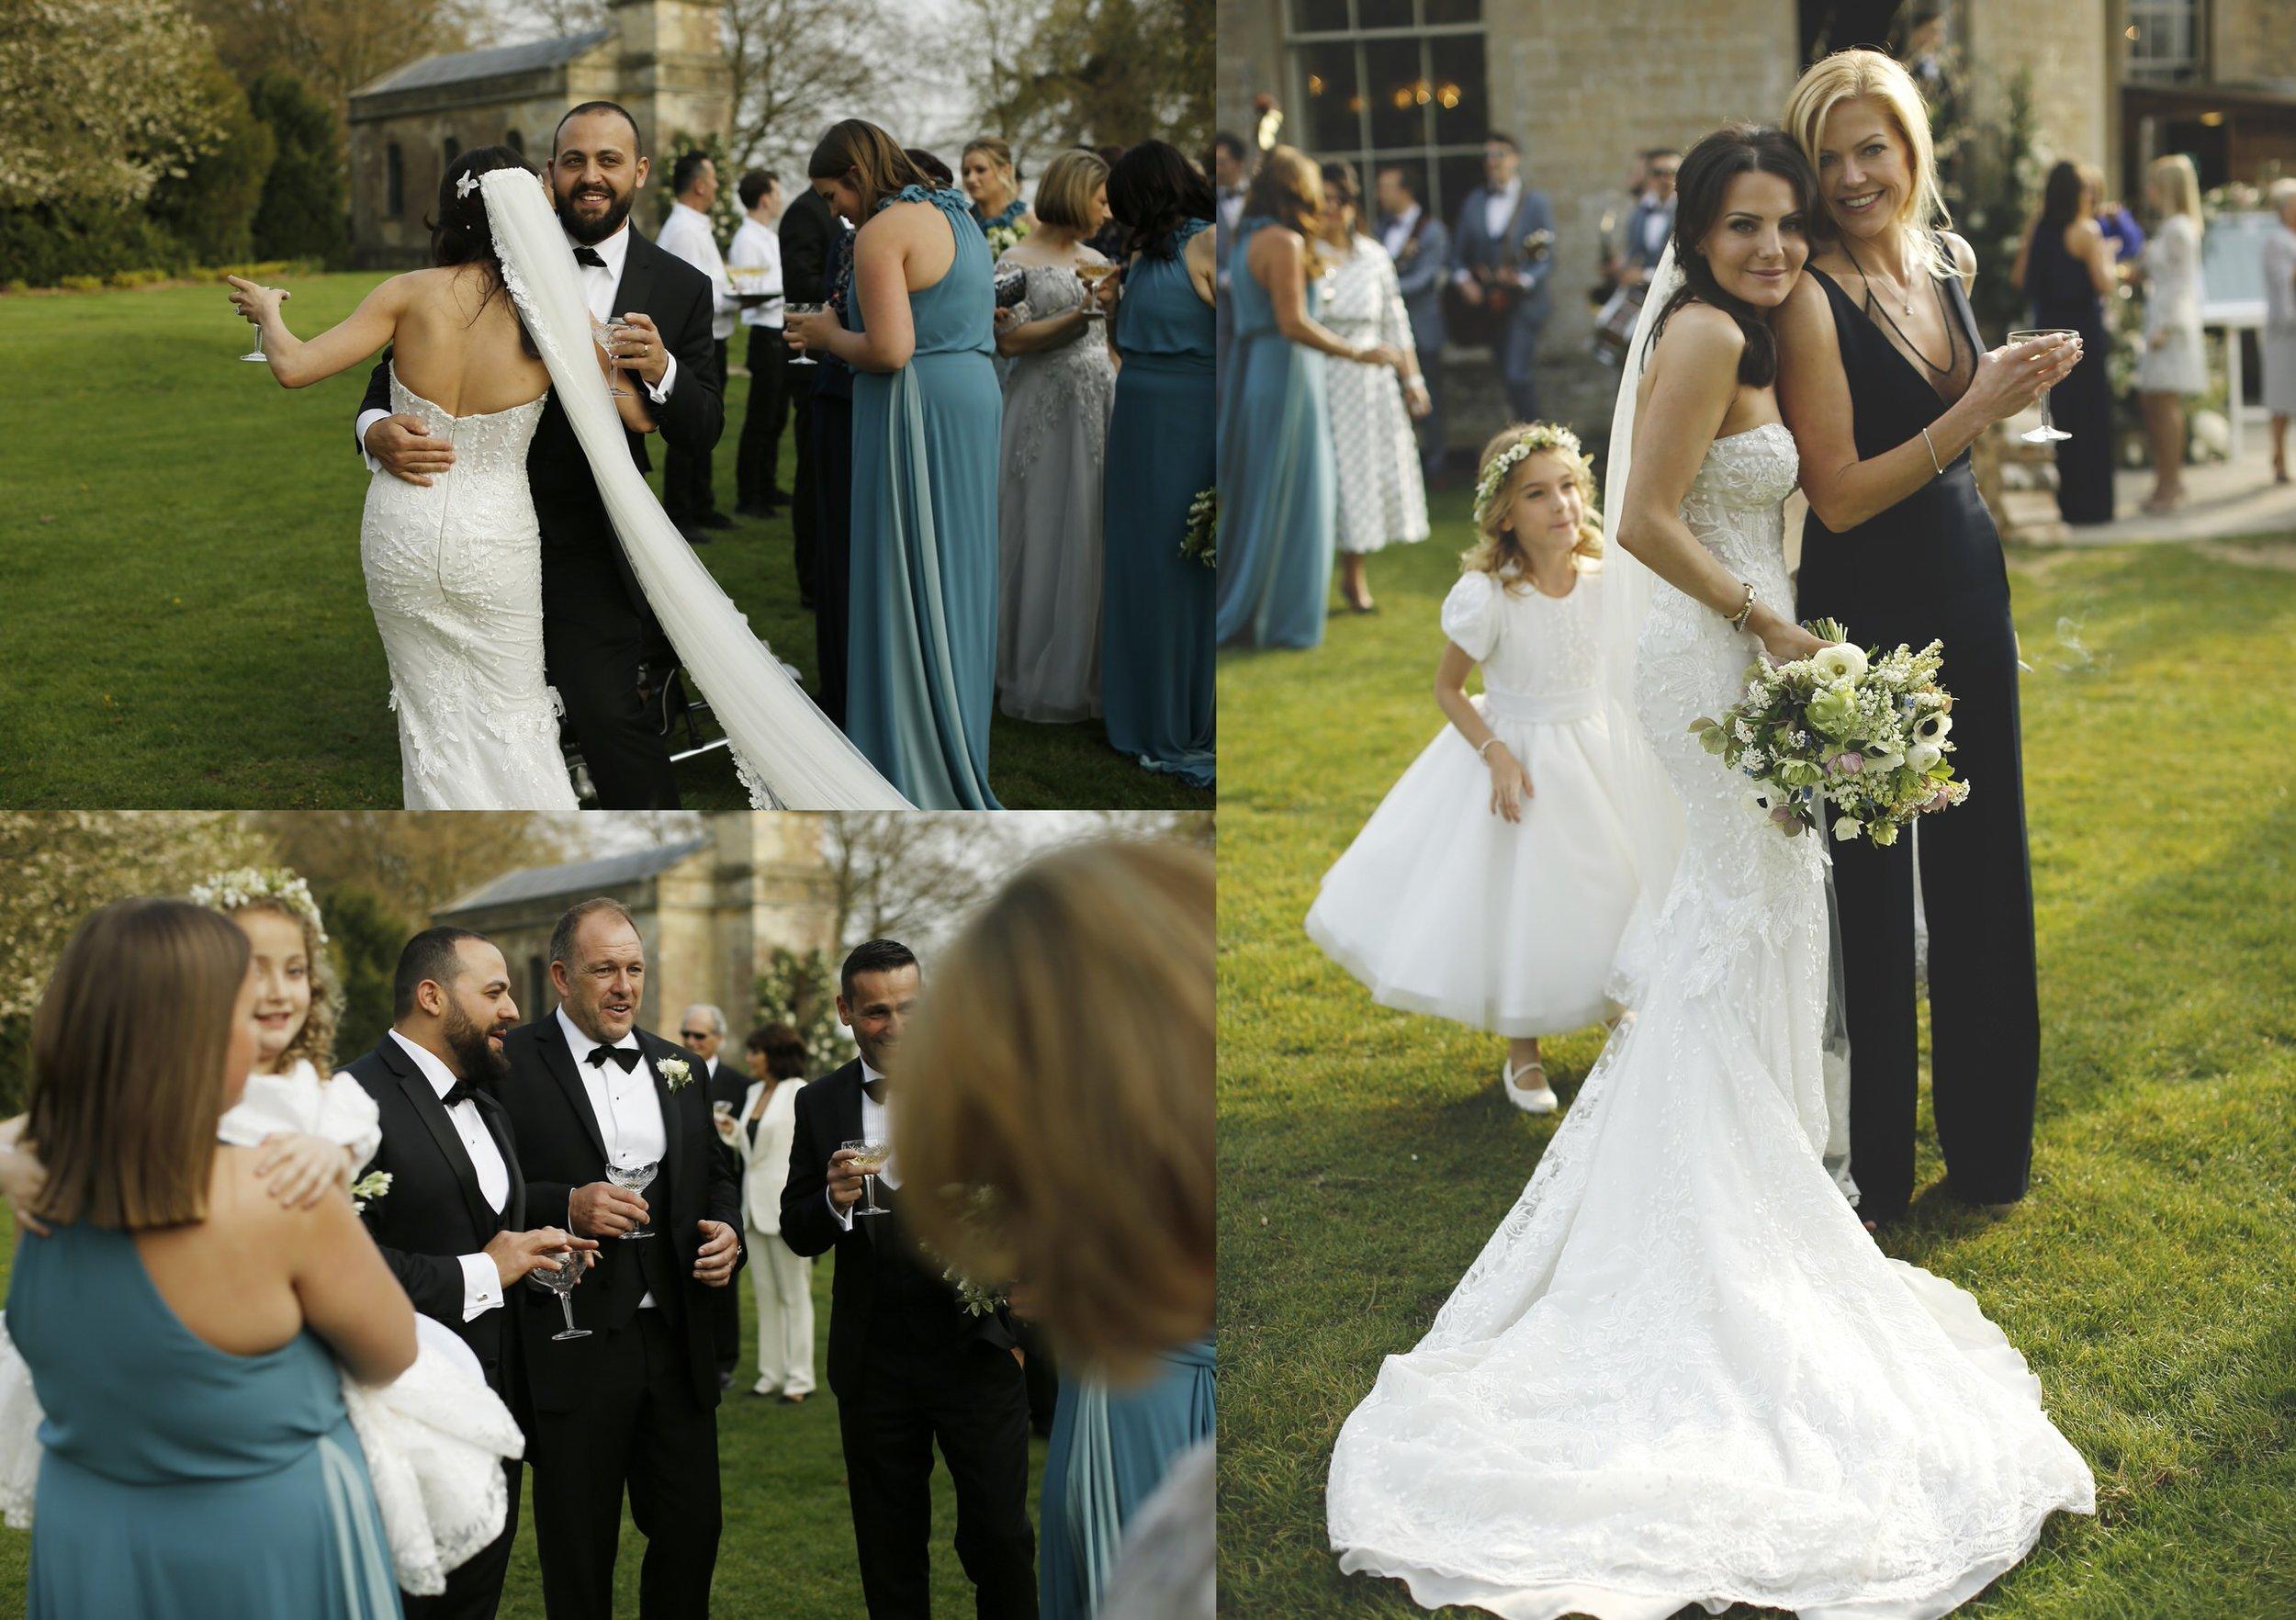 brettharkness-luxury-wedding-photographer-uk_0036.jpg